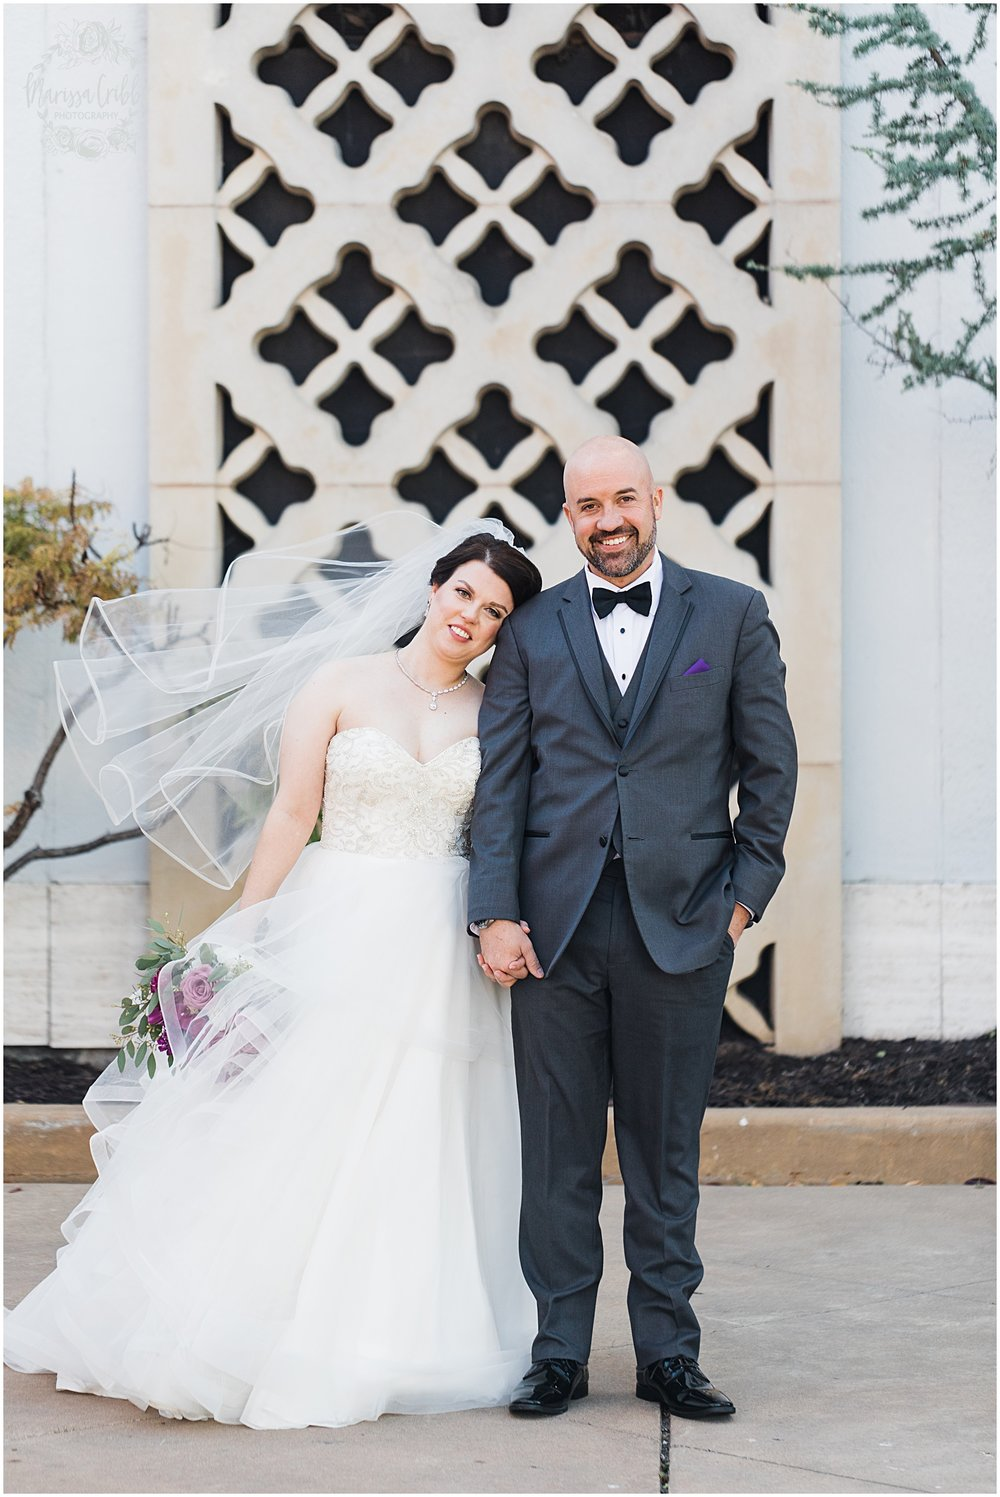 LAURA & DAN MARRIED   NELSON ATKINS MUSEUM   MARISSA CRIBBS PHOTOGRAPHY_7013.jpg